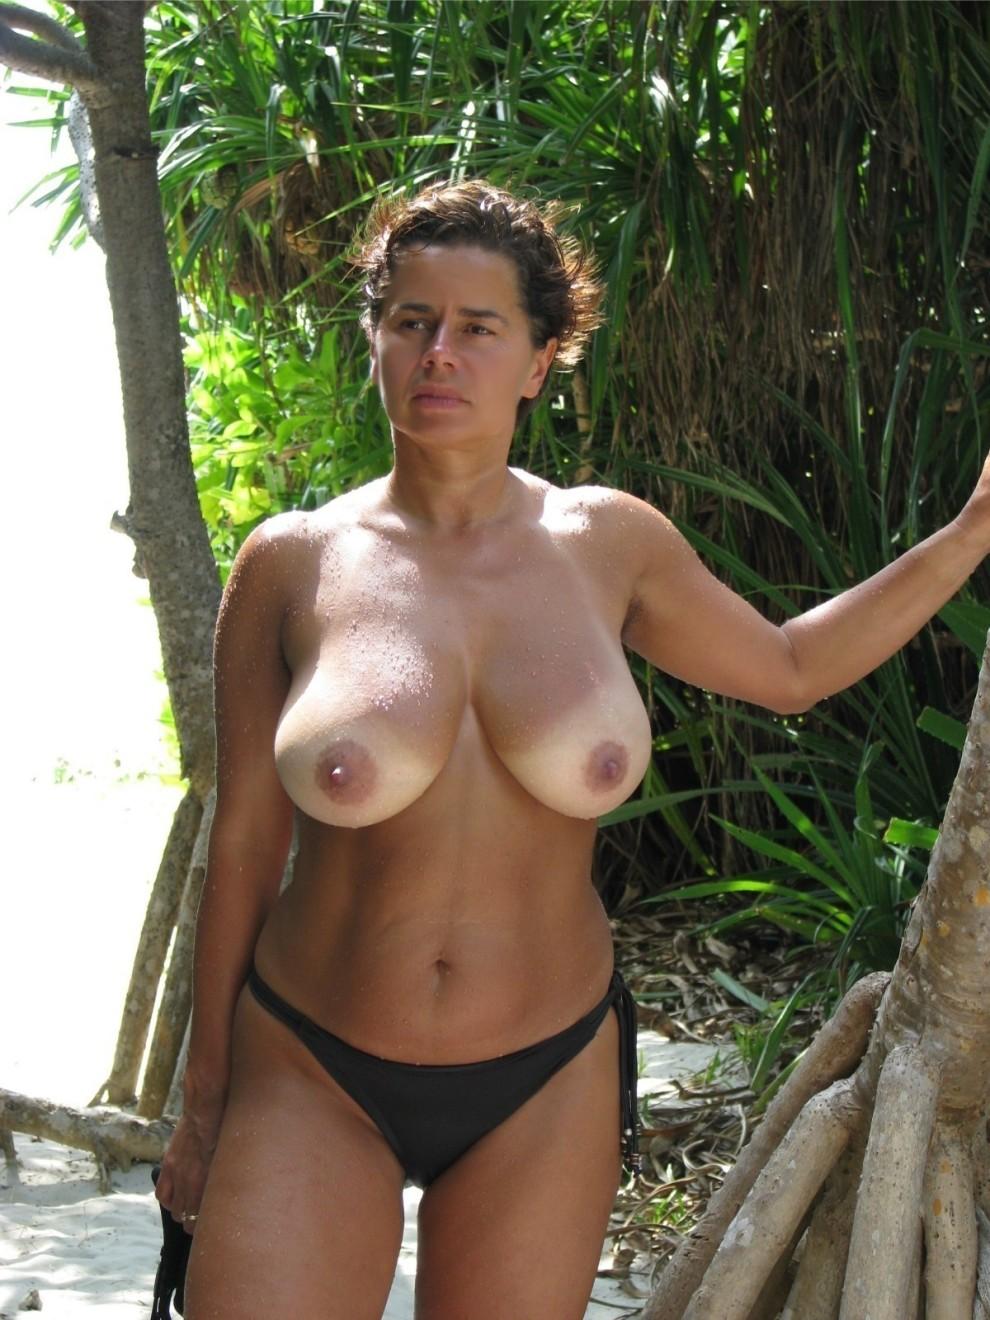 Topless tan lines